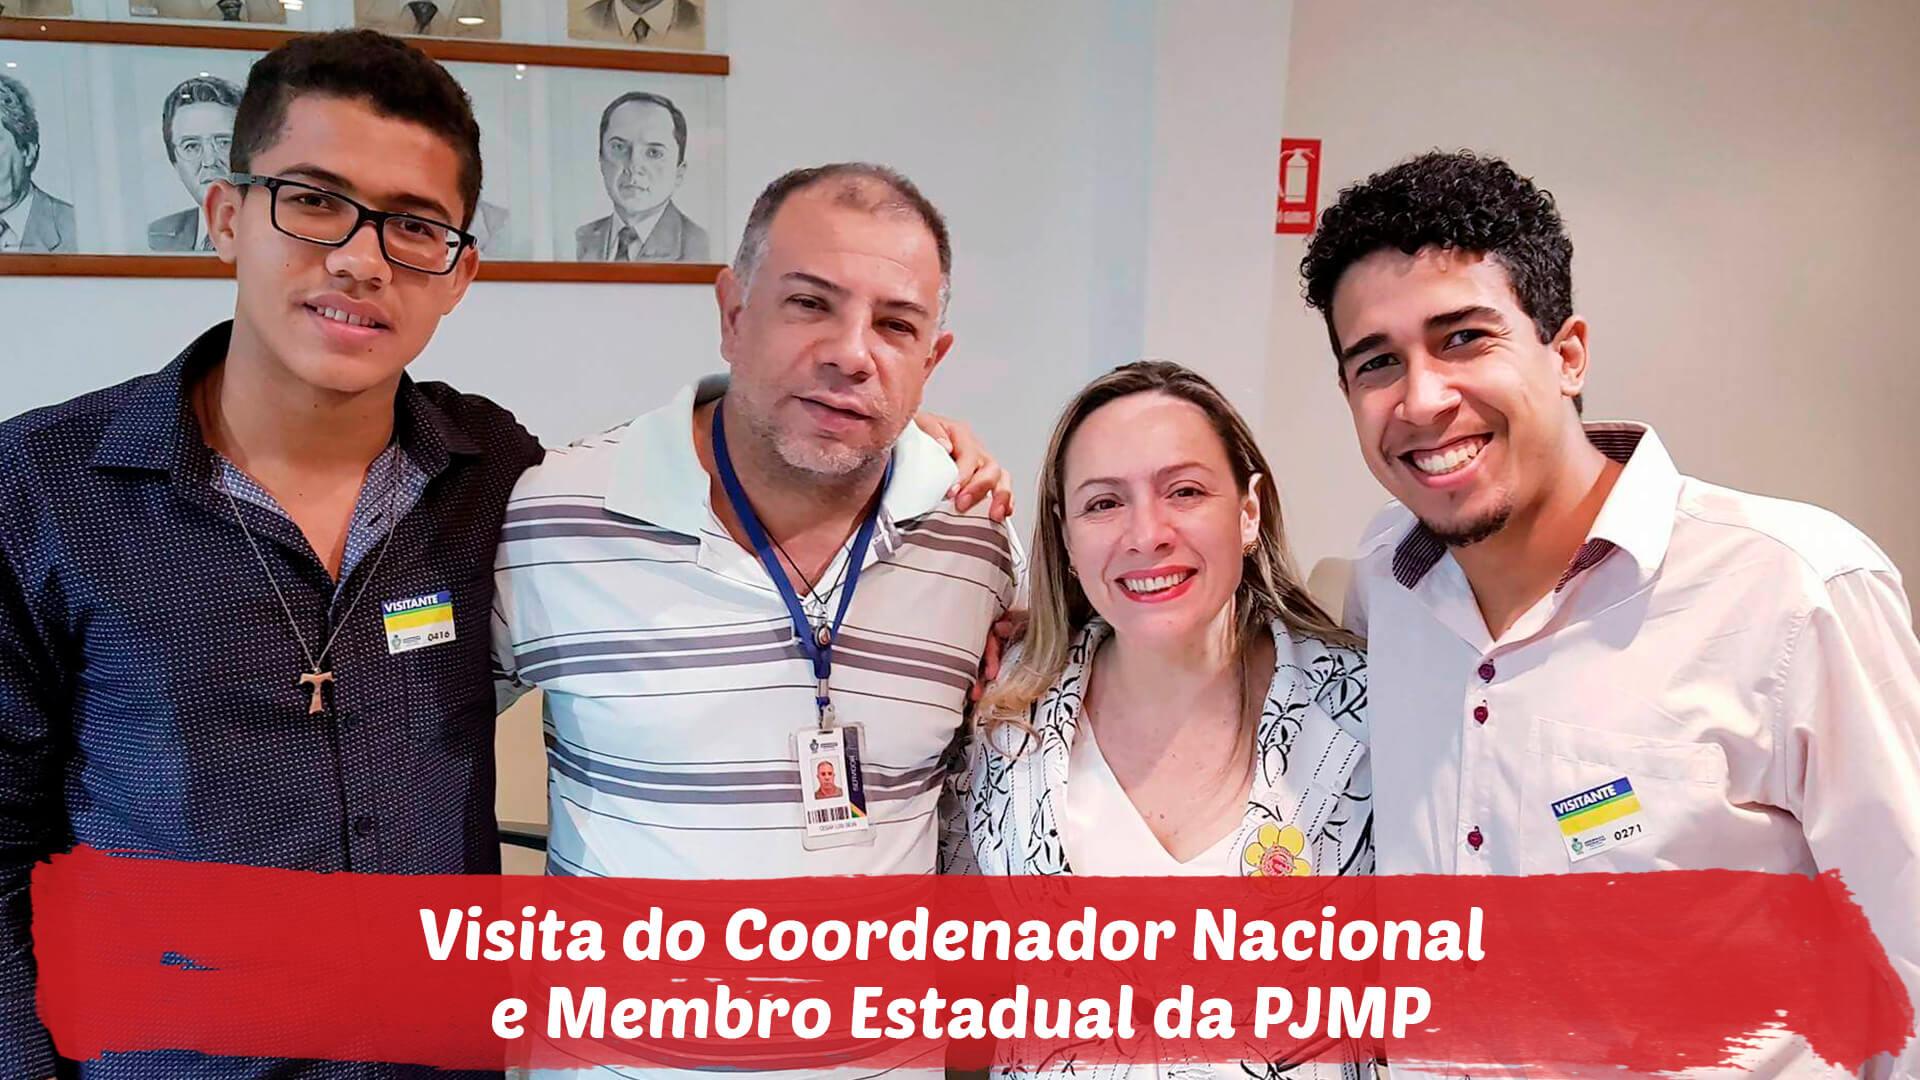 Visita do Coordenador Nacional da Pastoral da Juventude do Meio Popular(PJMP) e do membro estadual da Pastoral